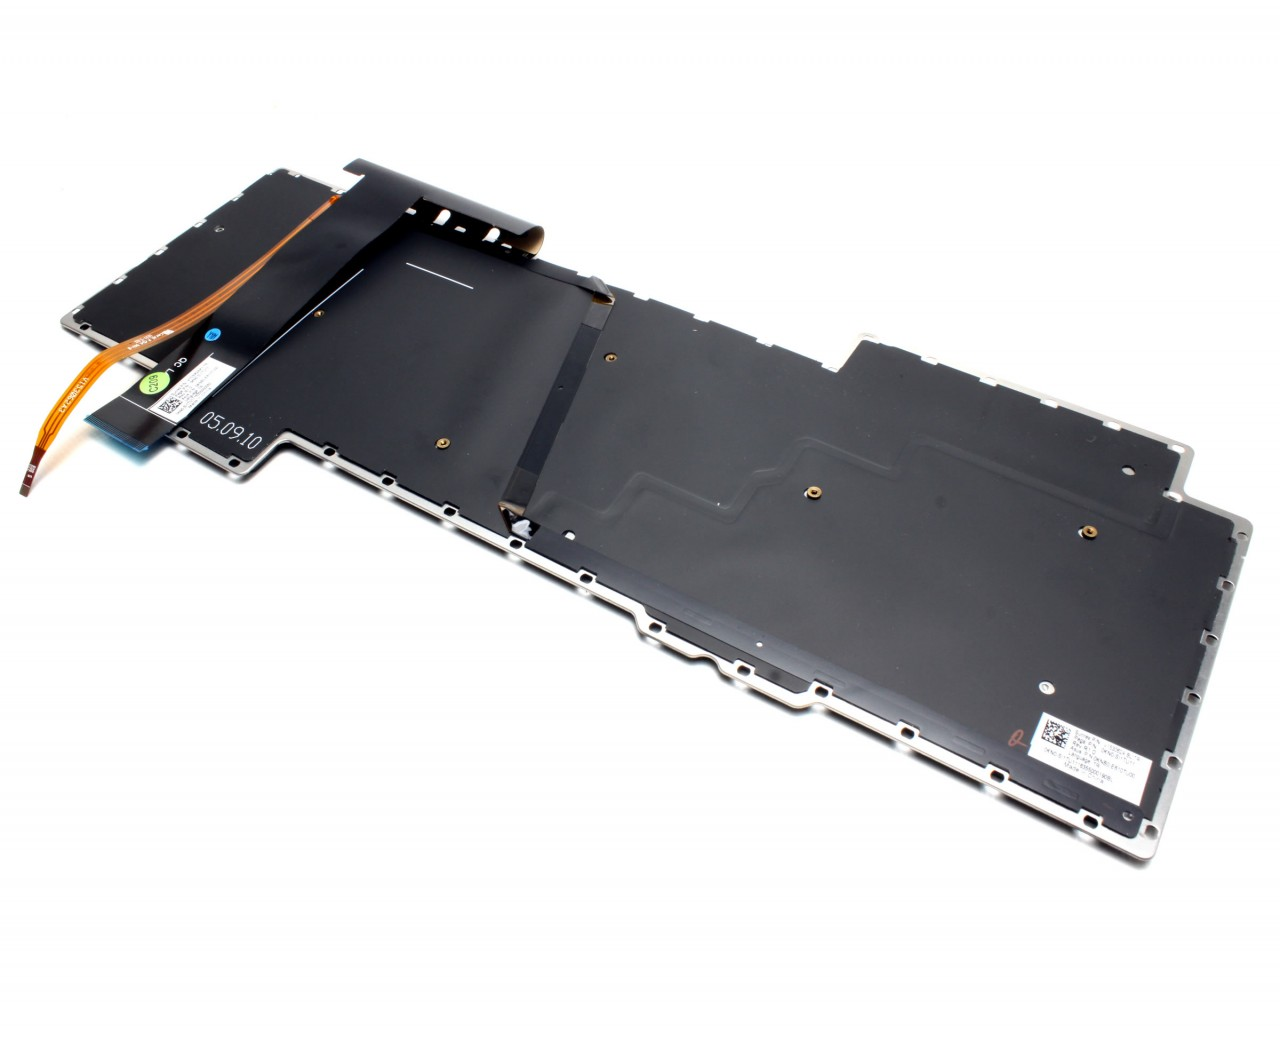 Tastatura Asus 0KNB0-E610TU00 iluminata layout UK fara rama enter mare imagine powerlaptop.ro 2021